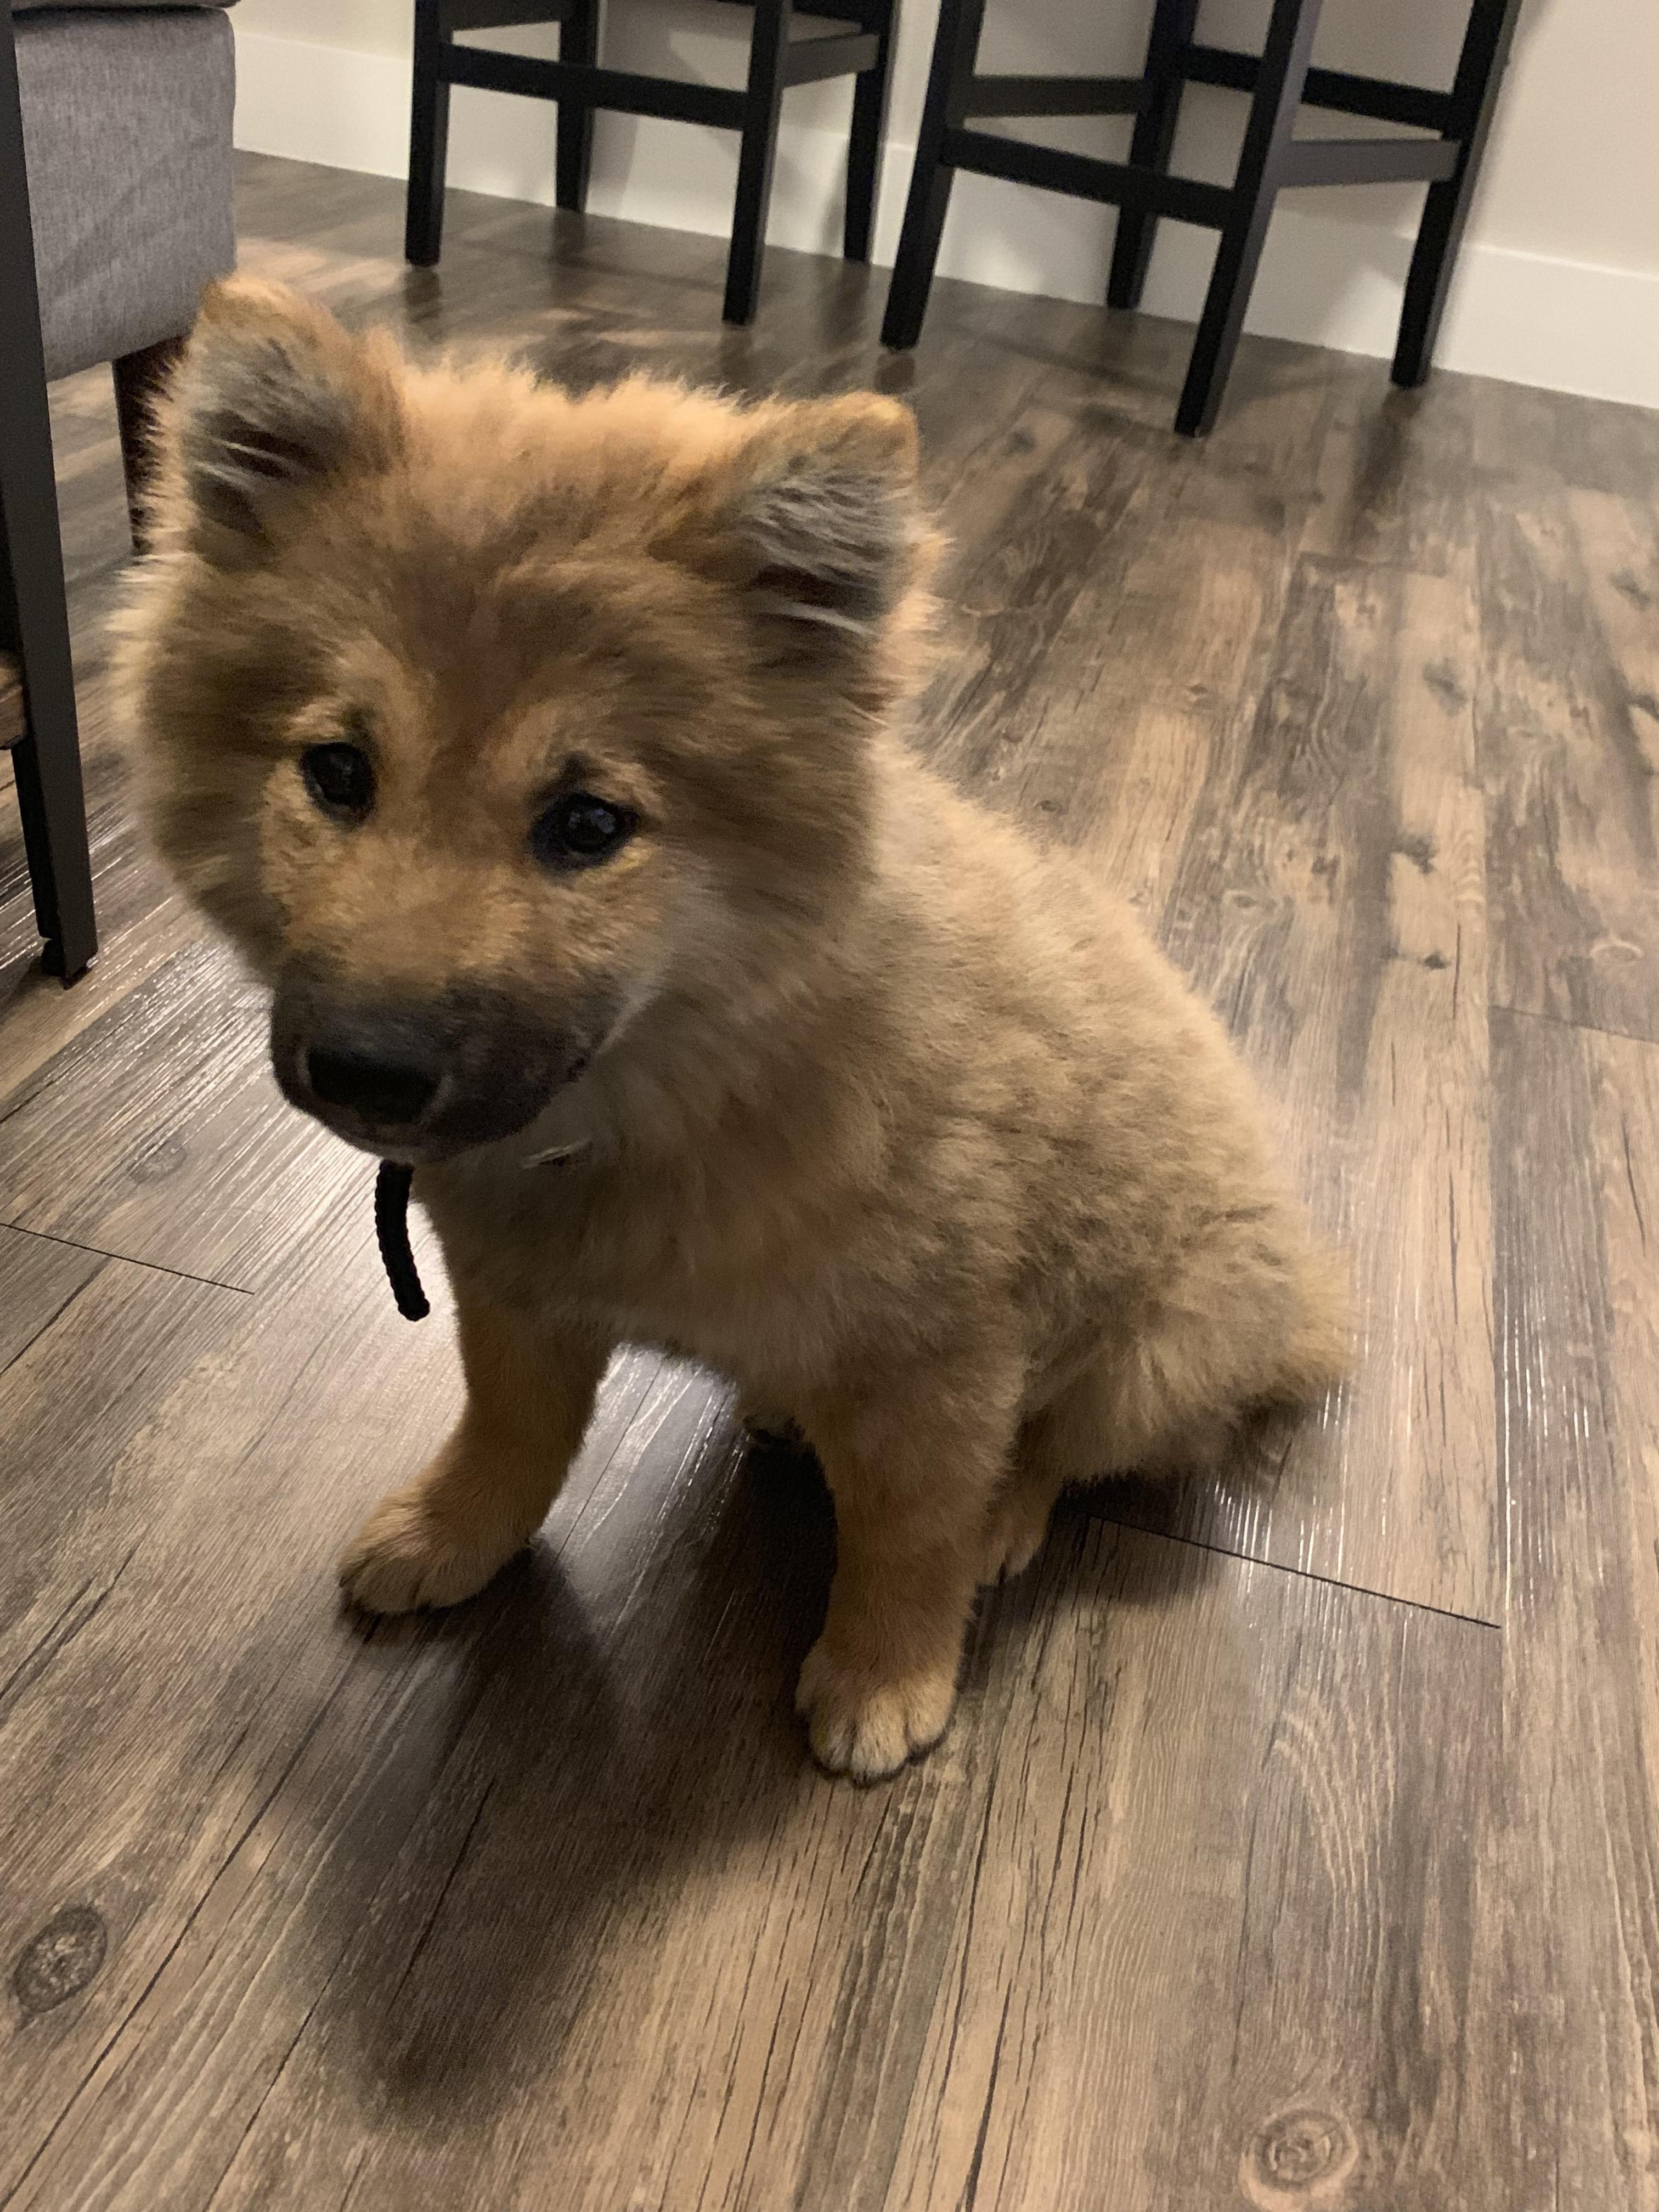 Reddit Meet My Long Hair Shiba Jiro Shibainu Shibainupuppies Dogs Animals Shiba Inu Puppy